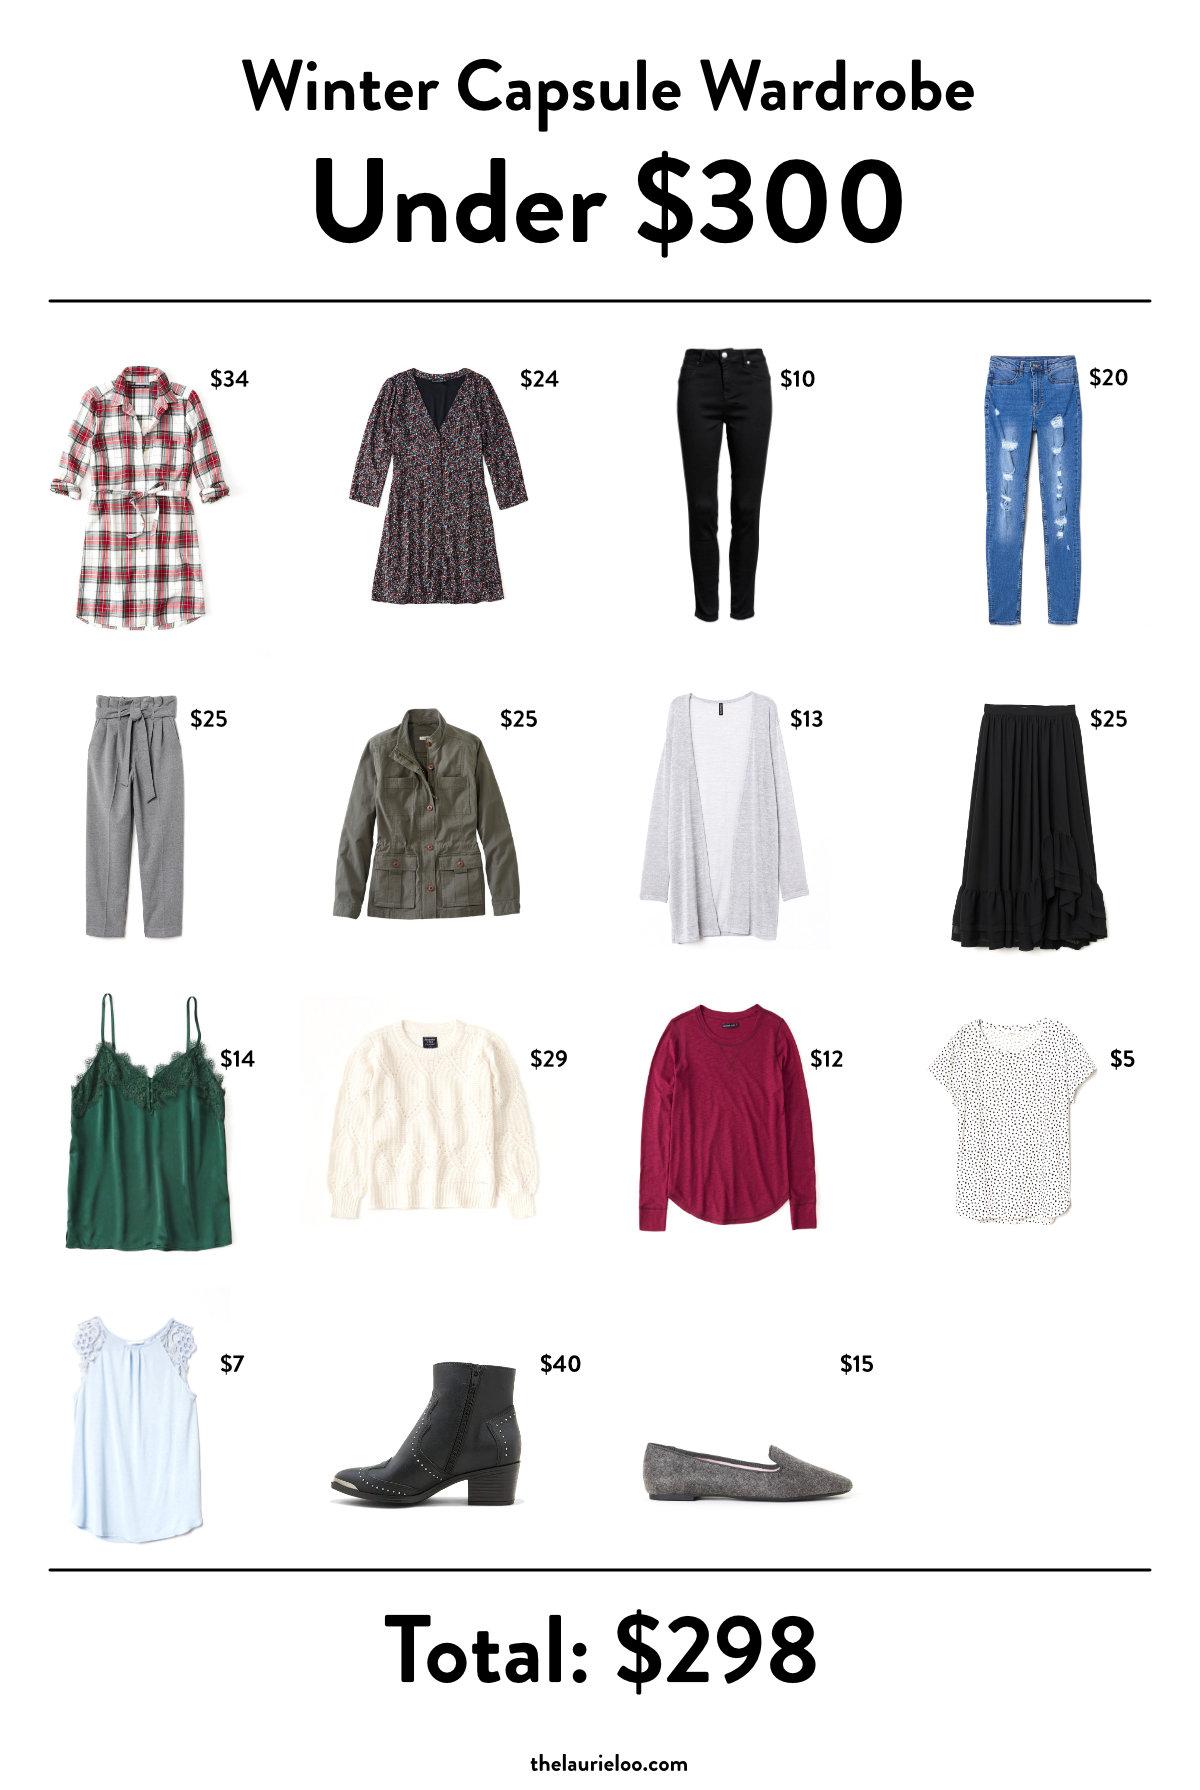 winter-capsule-wardrobe-prices